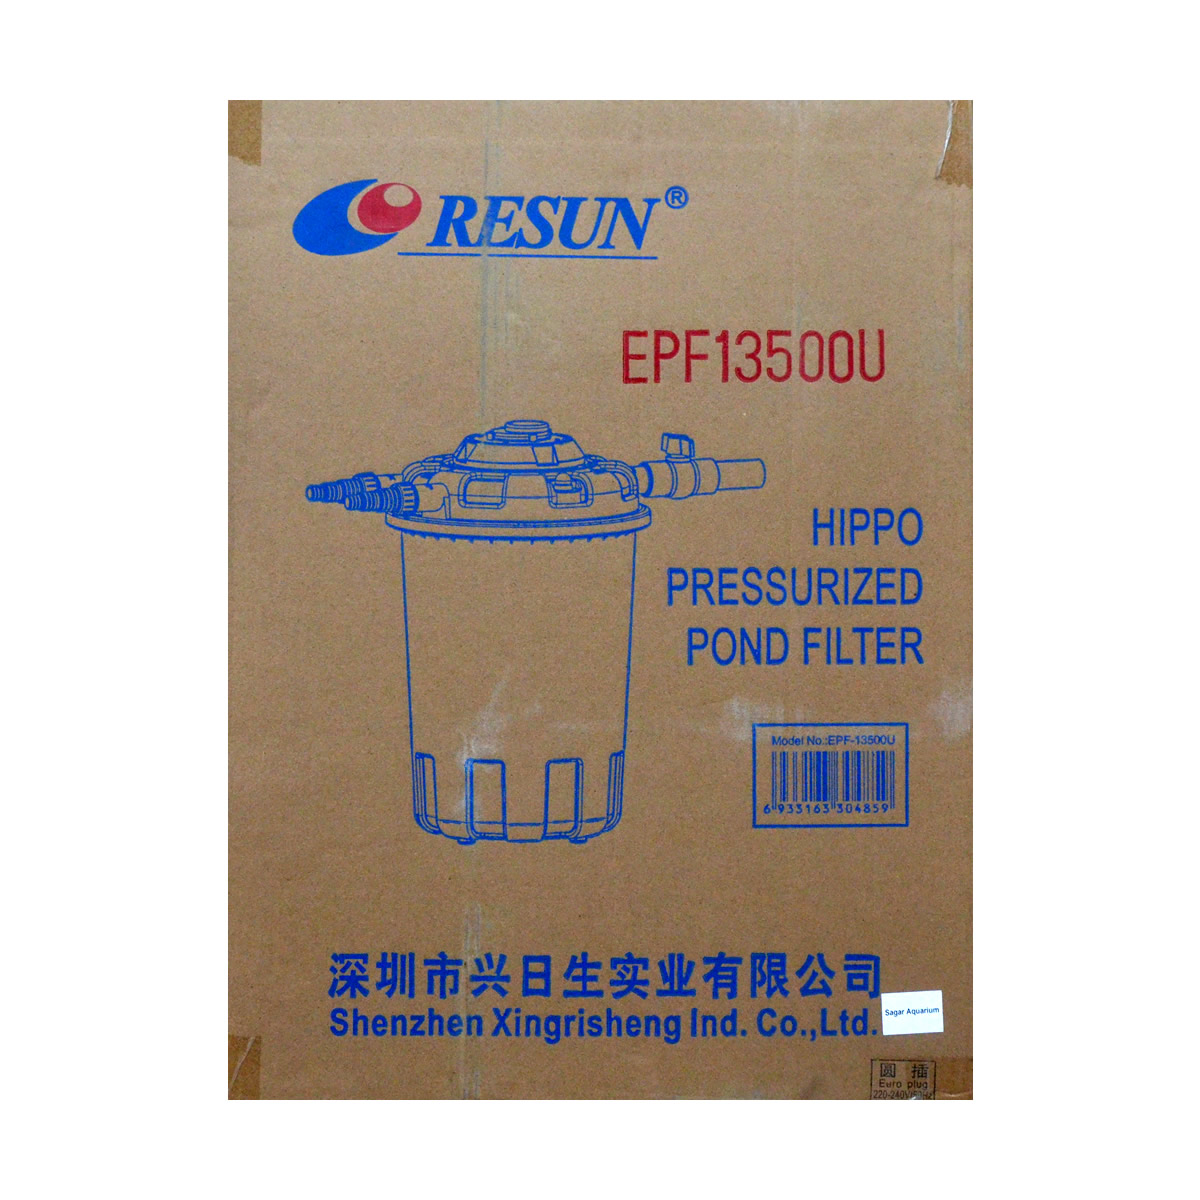 ReSun EPF13500U Hippo Pressurized Pond Filter With 24W UV 30L 18000-36000L